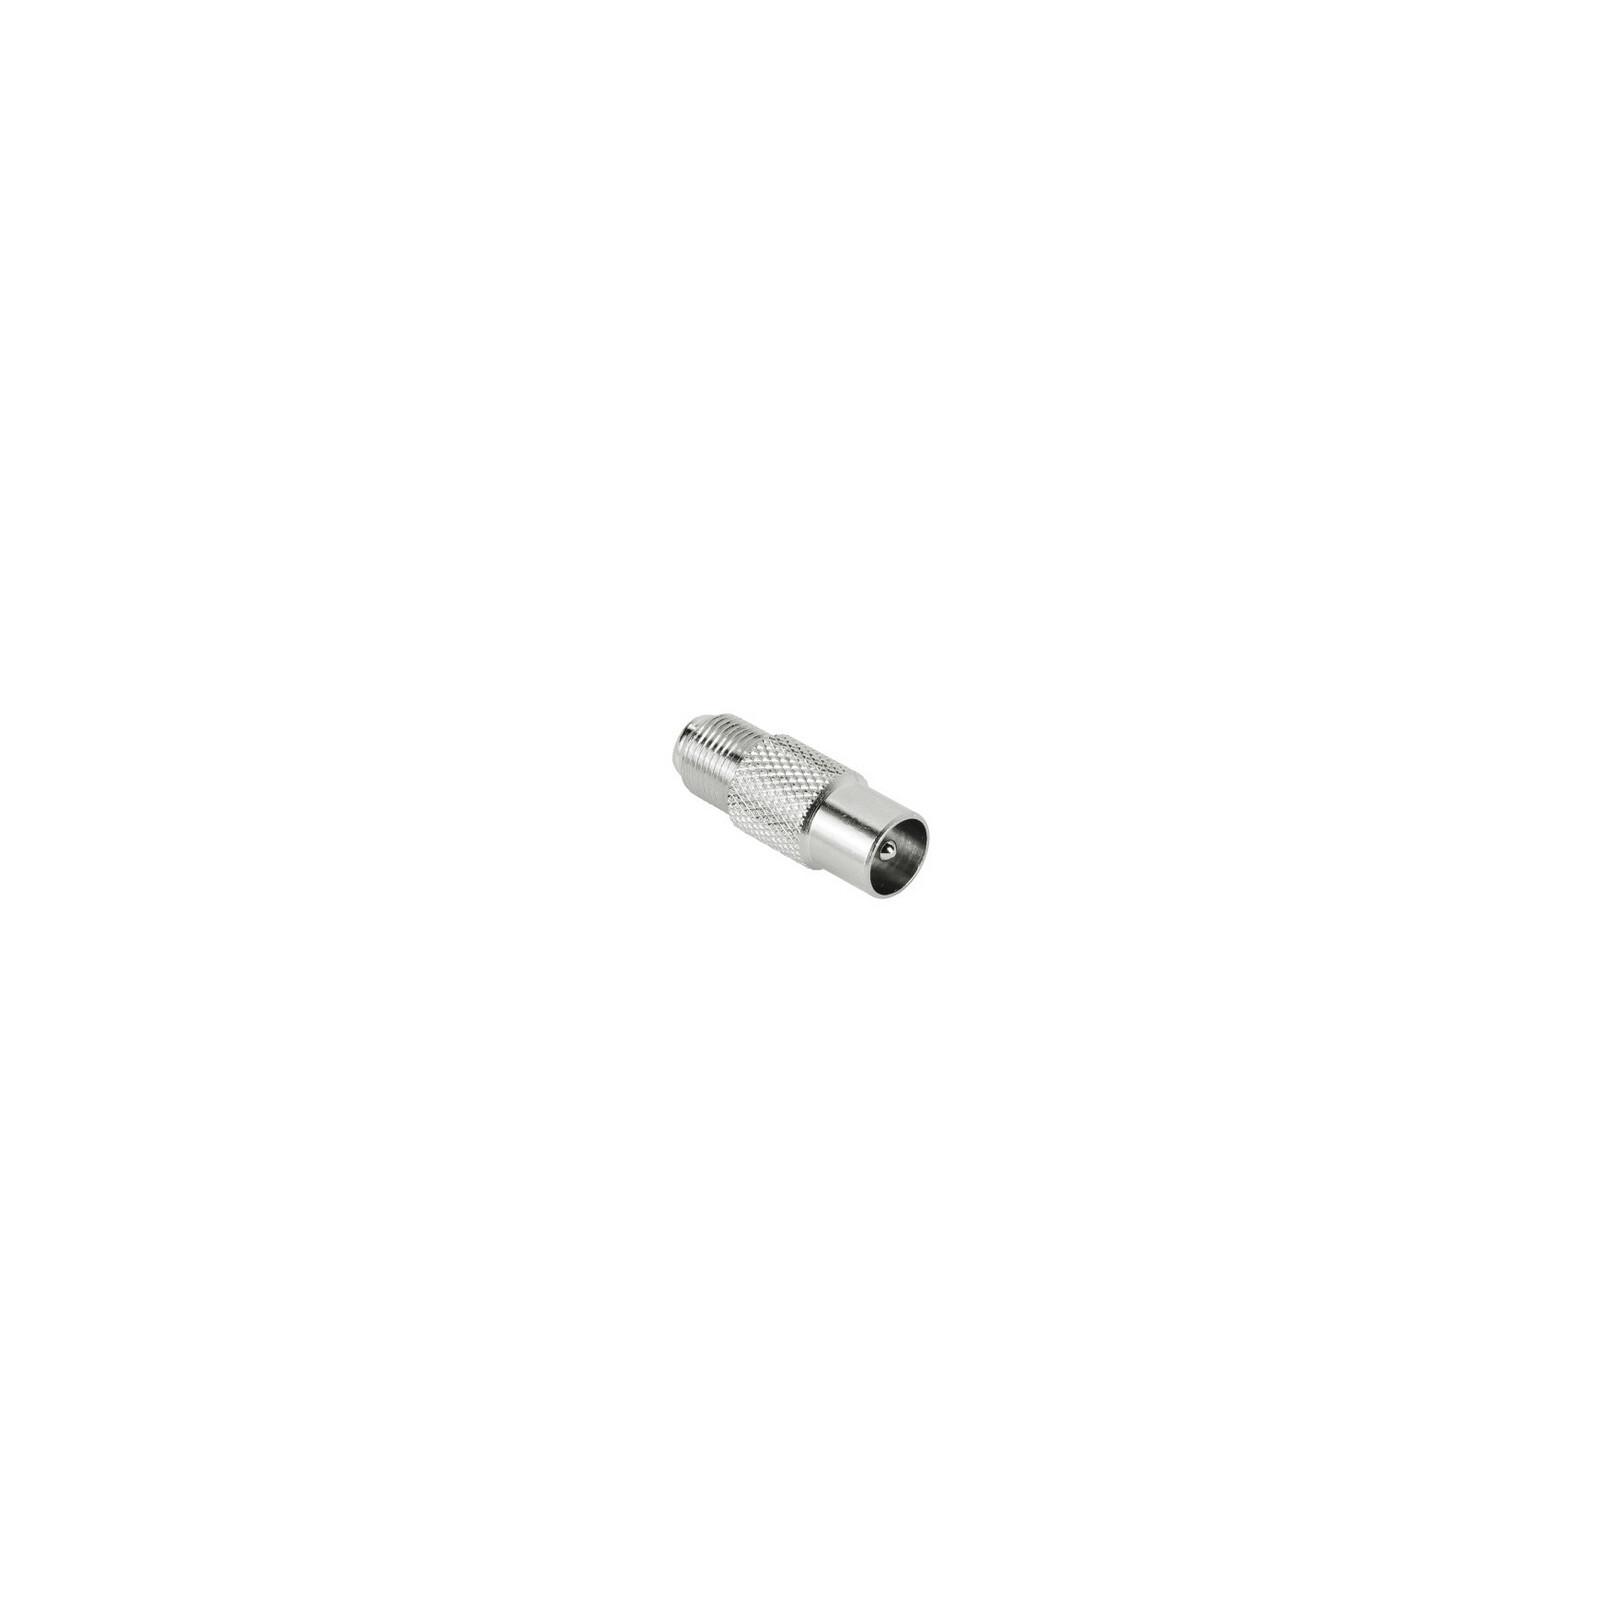 Hama 122487 Sat Adapter F/Koax